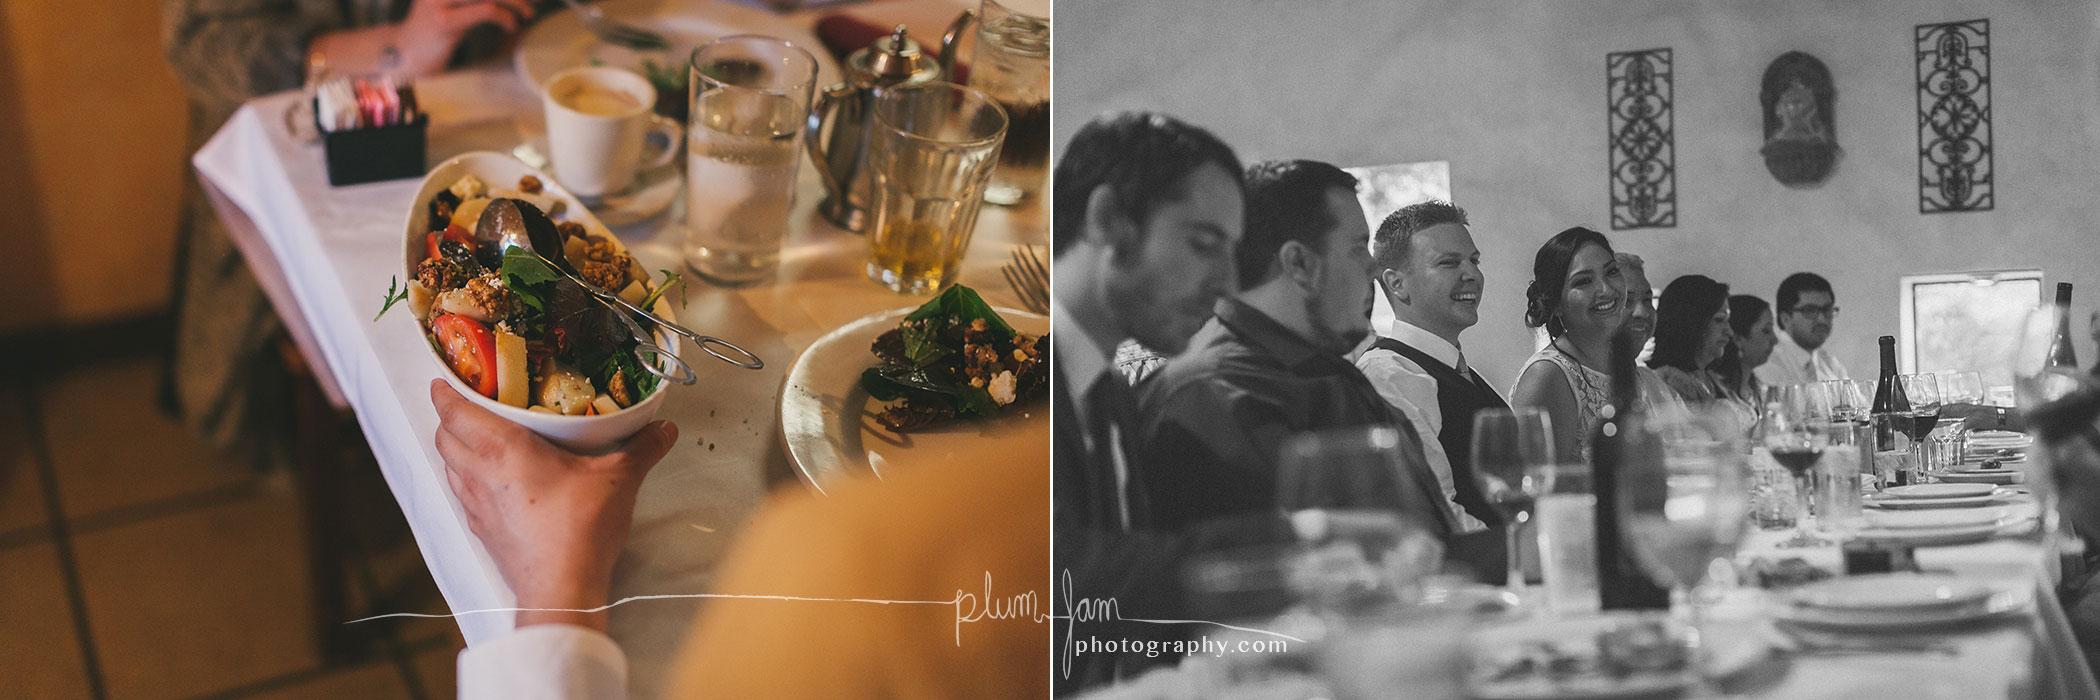 SelinaCameron-24-Blog-PlumJamPhotography